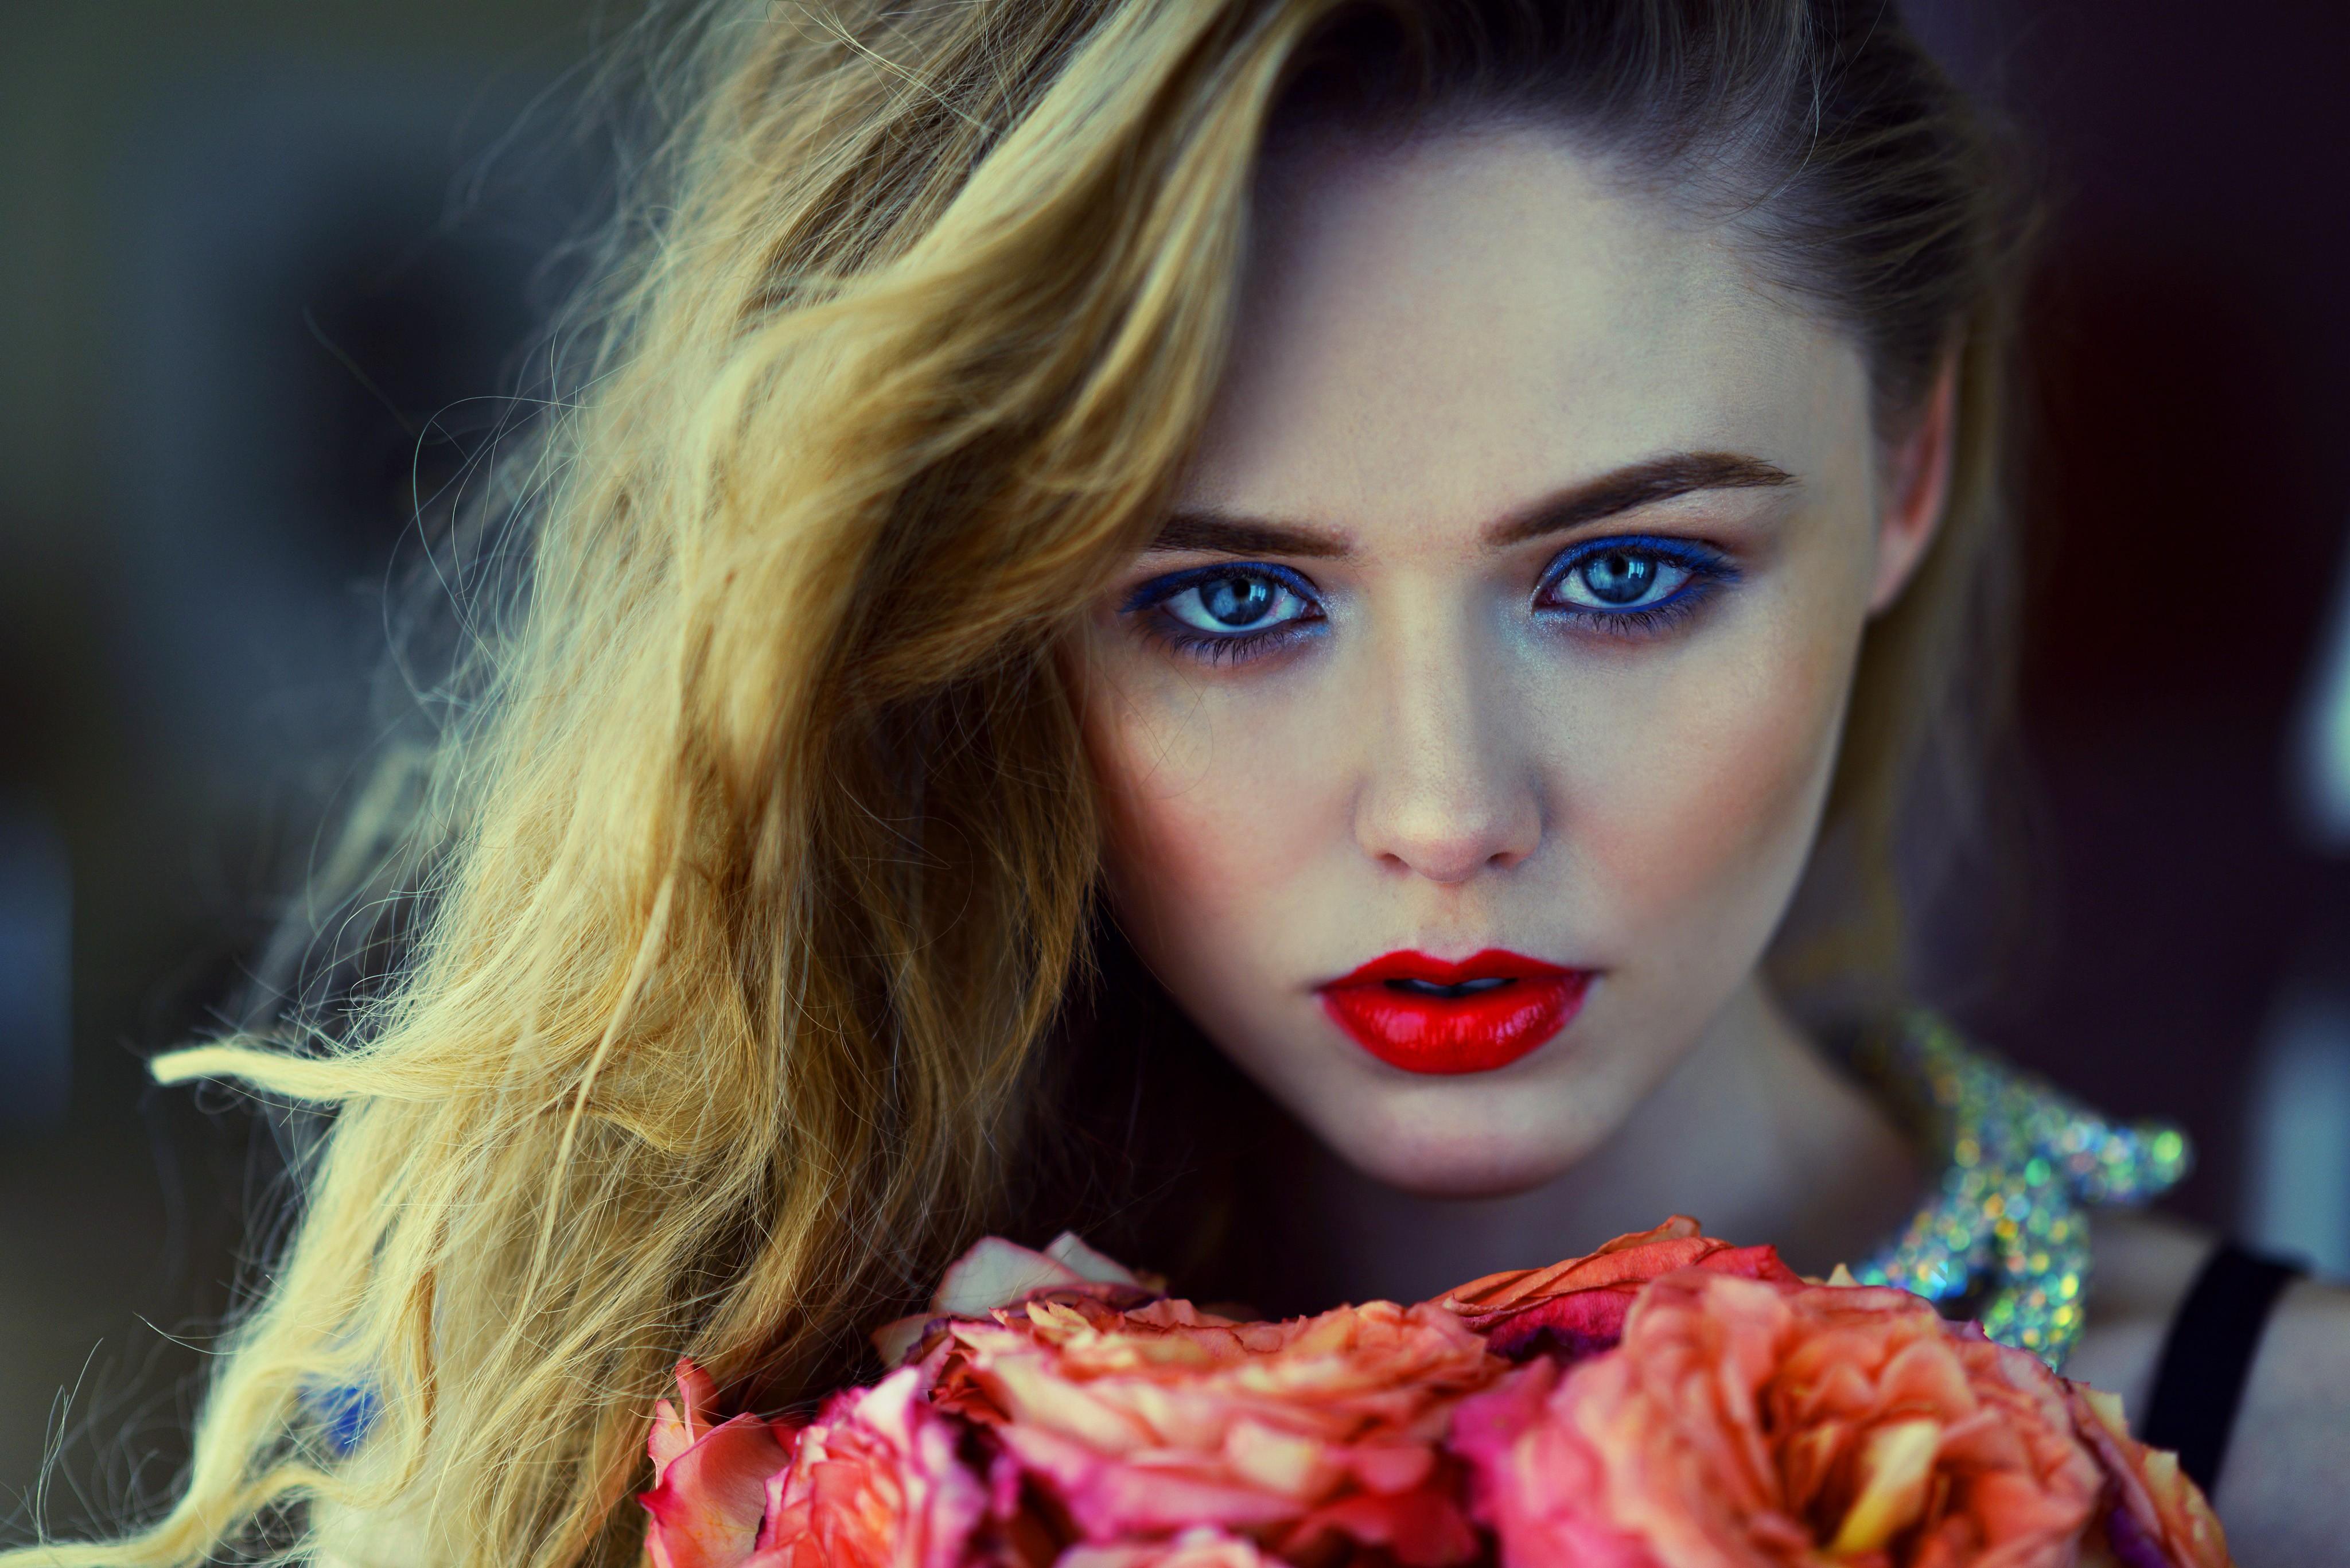 Red Lipstick Brown Hair Blue Eyes: Wallpaper : Face, Women, Model, Flowers, Long Hair, Blue